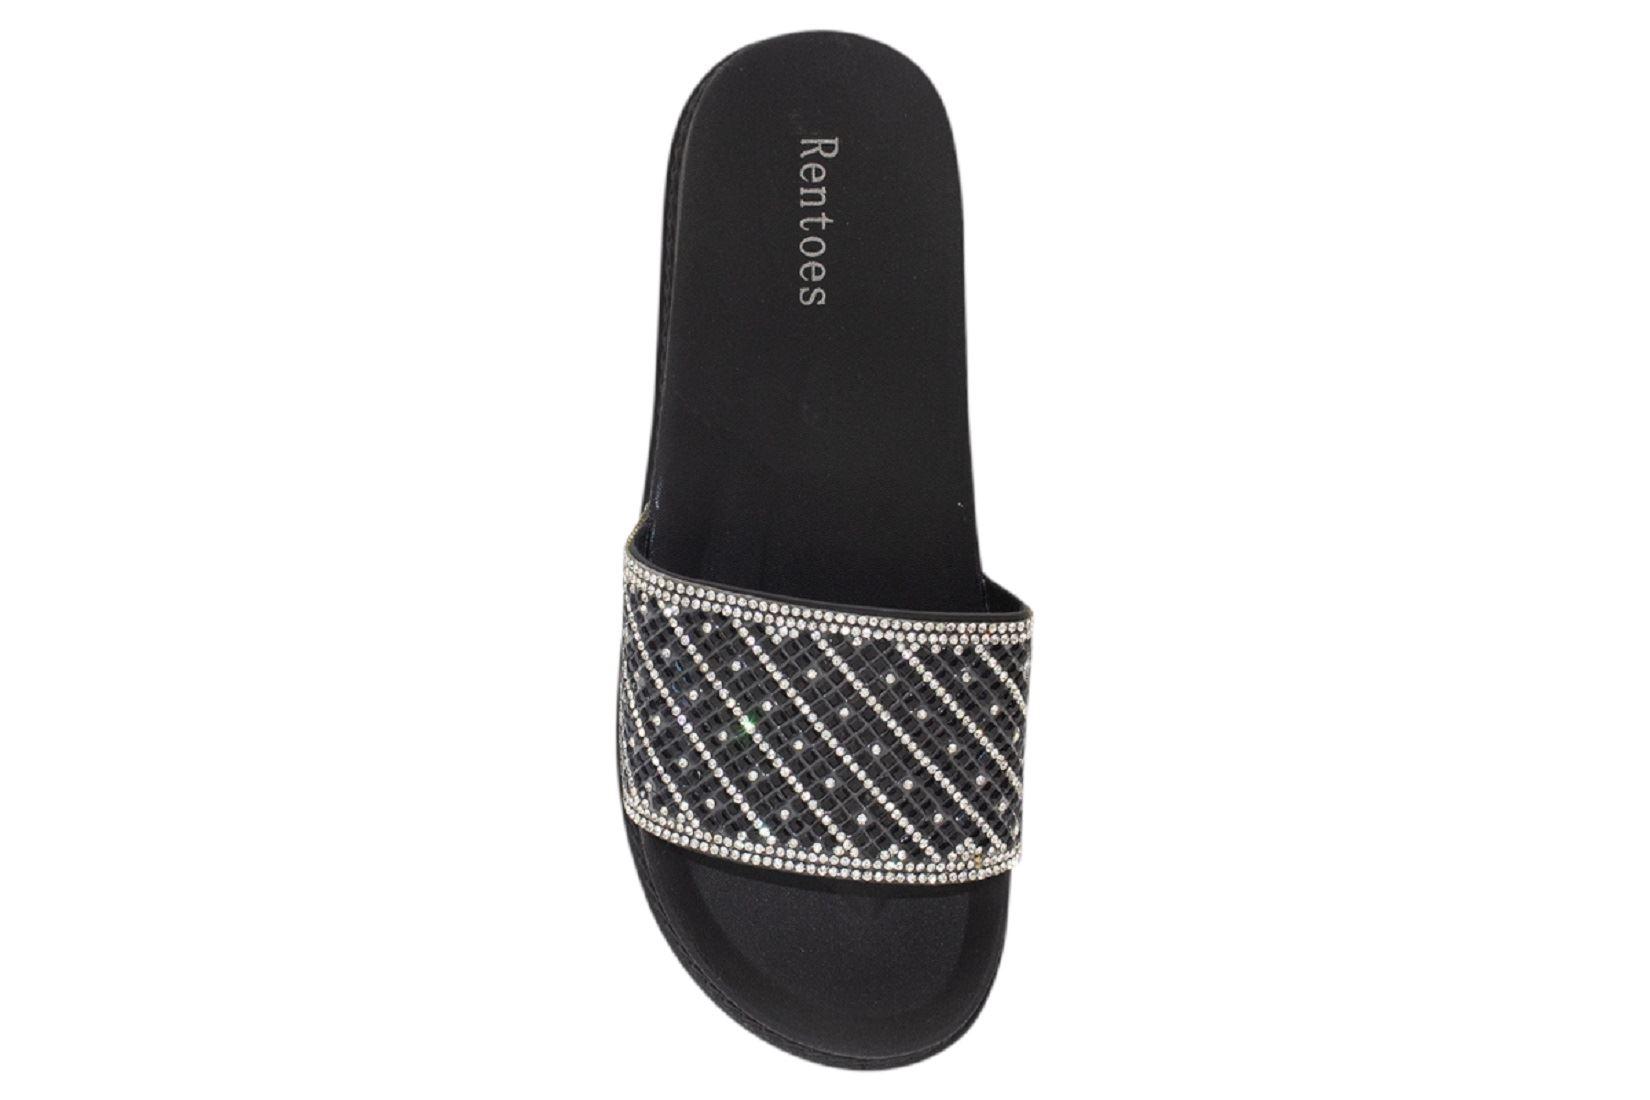 Womens-Sliders-Casual-Slippers-Mules-Ladies-Diamante-Flip-Flop-Sandals-Shoes thumbnail 60